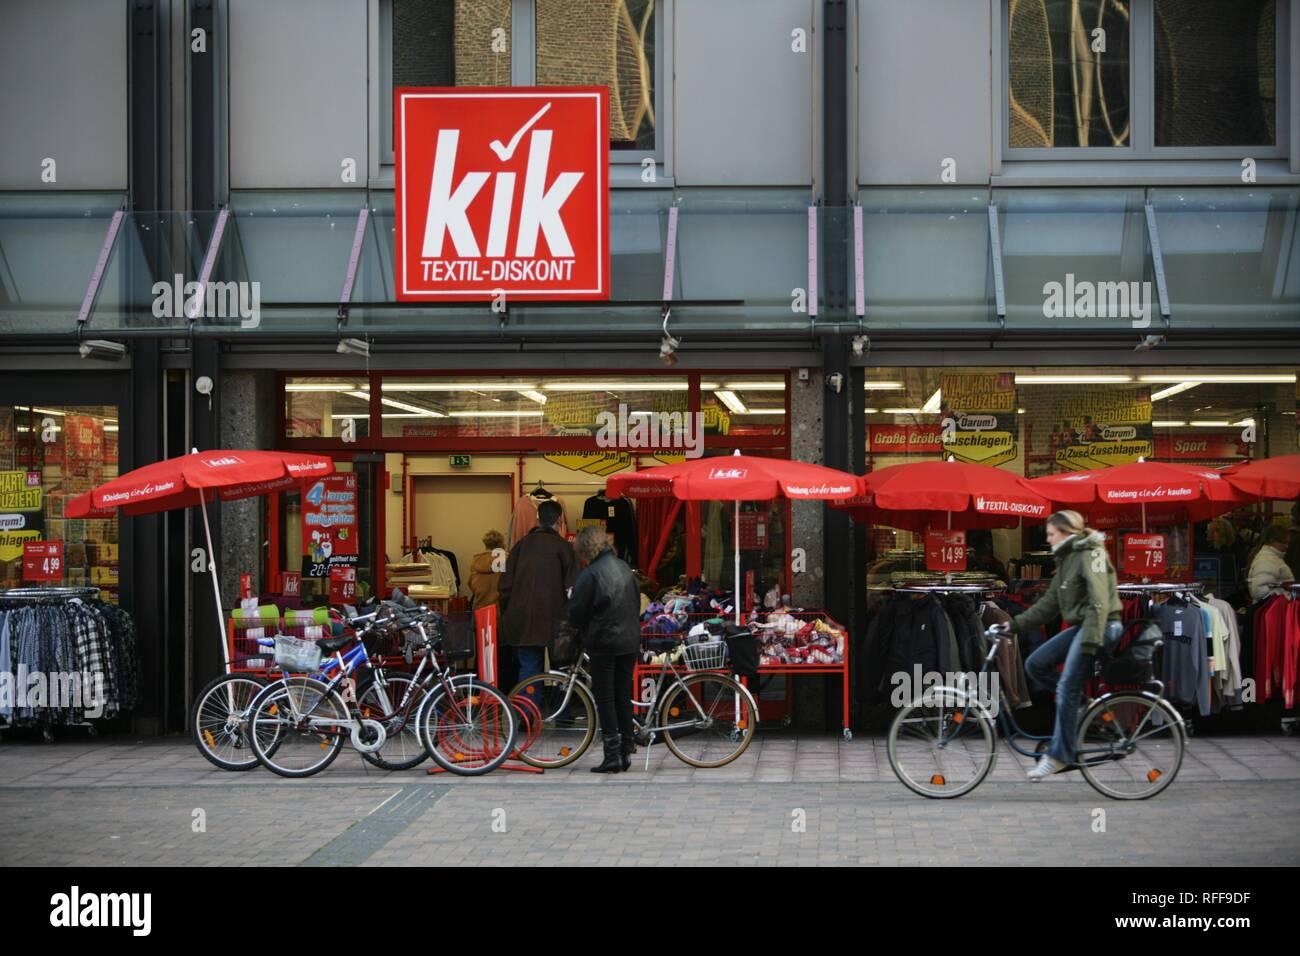 shop kik fashion discounter high resolution stock